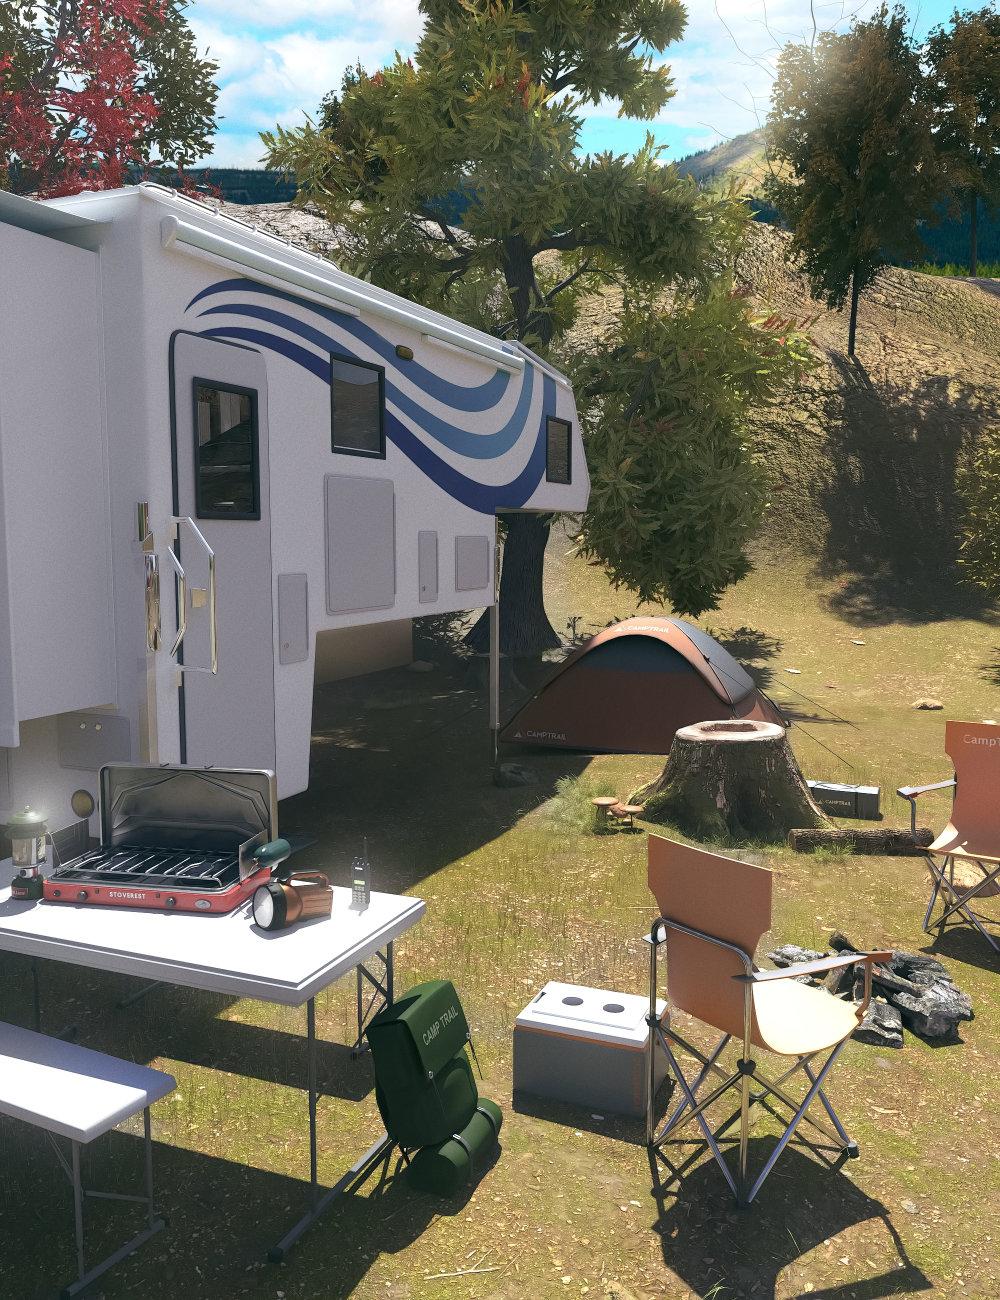 FG Camping by: Fugazi1968Ironman, 3D Models by Daz 3D